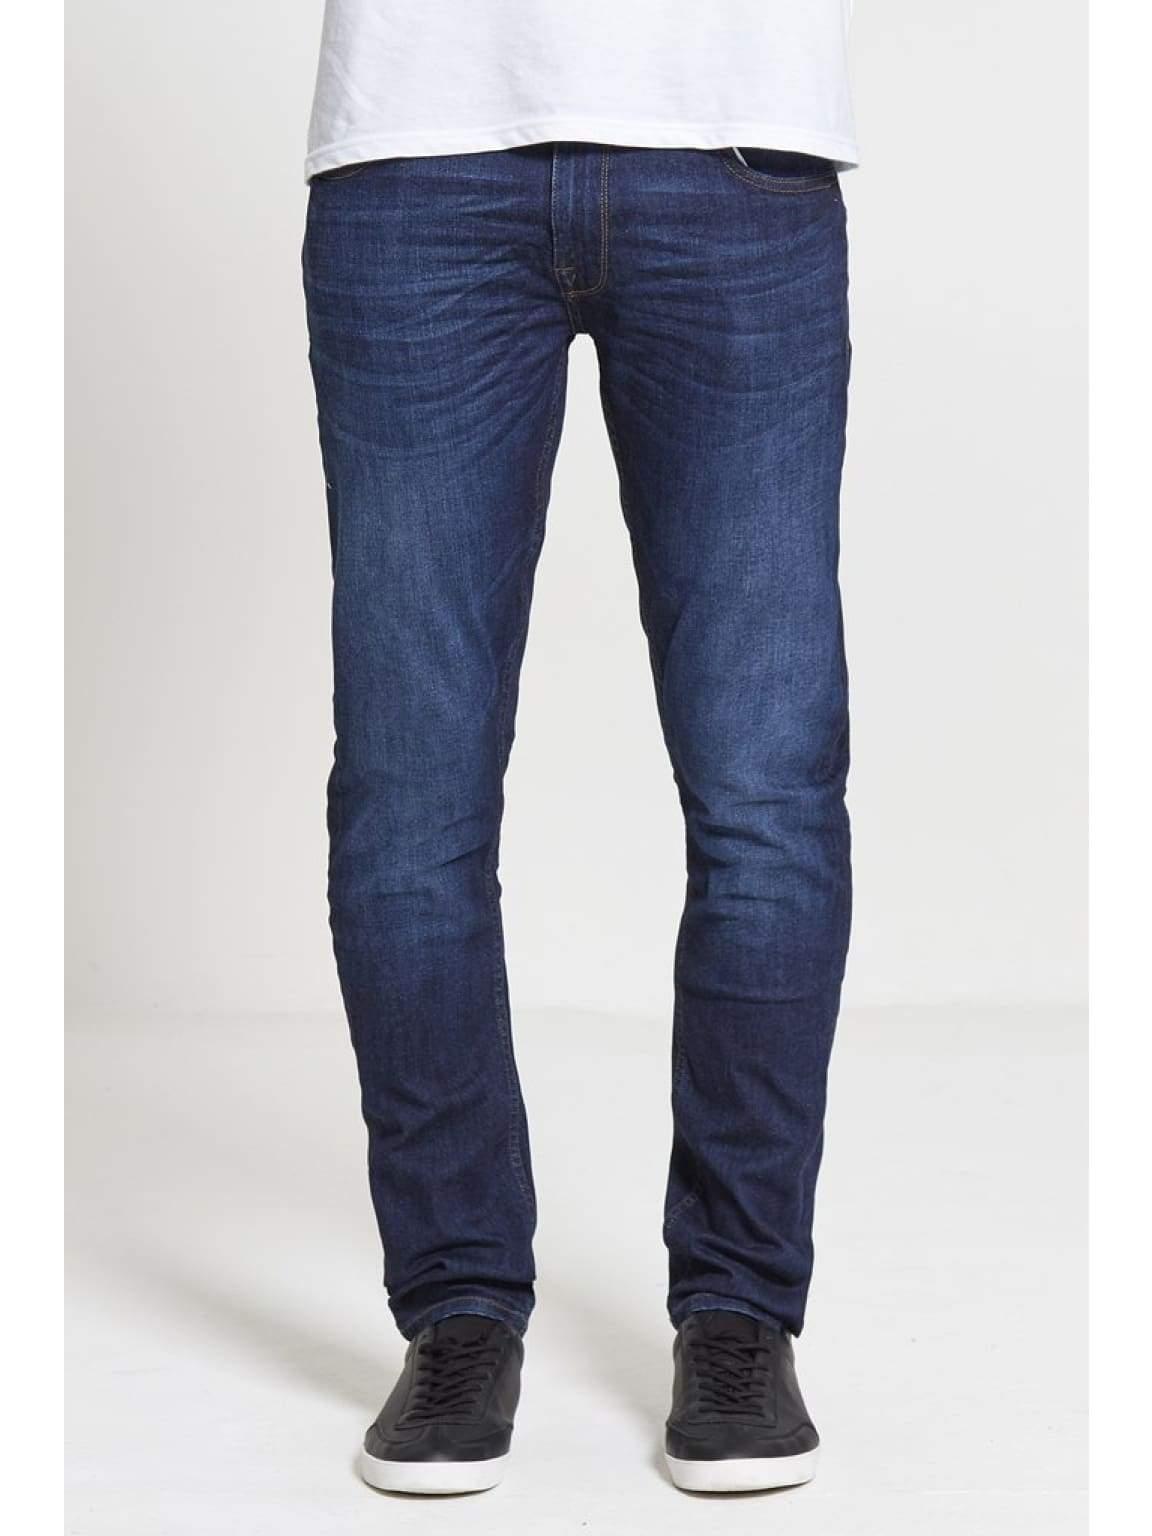 ACE Slim Stretch Jeans In Dark Wash - Jeans